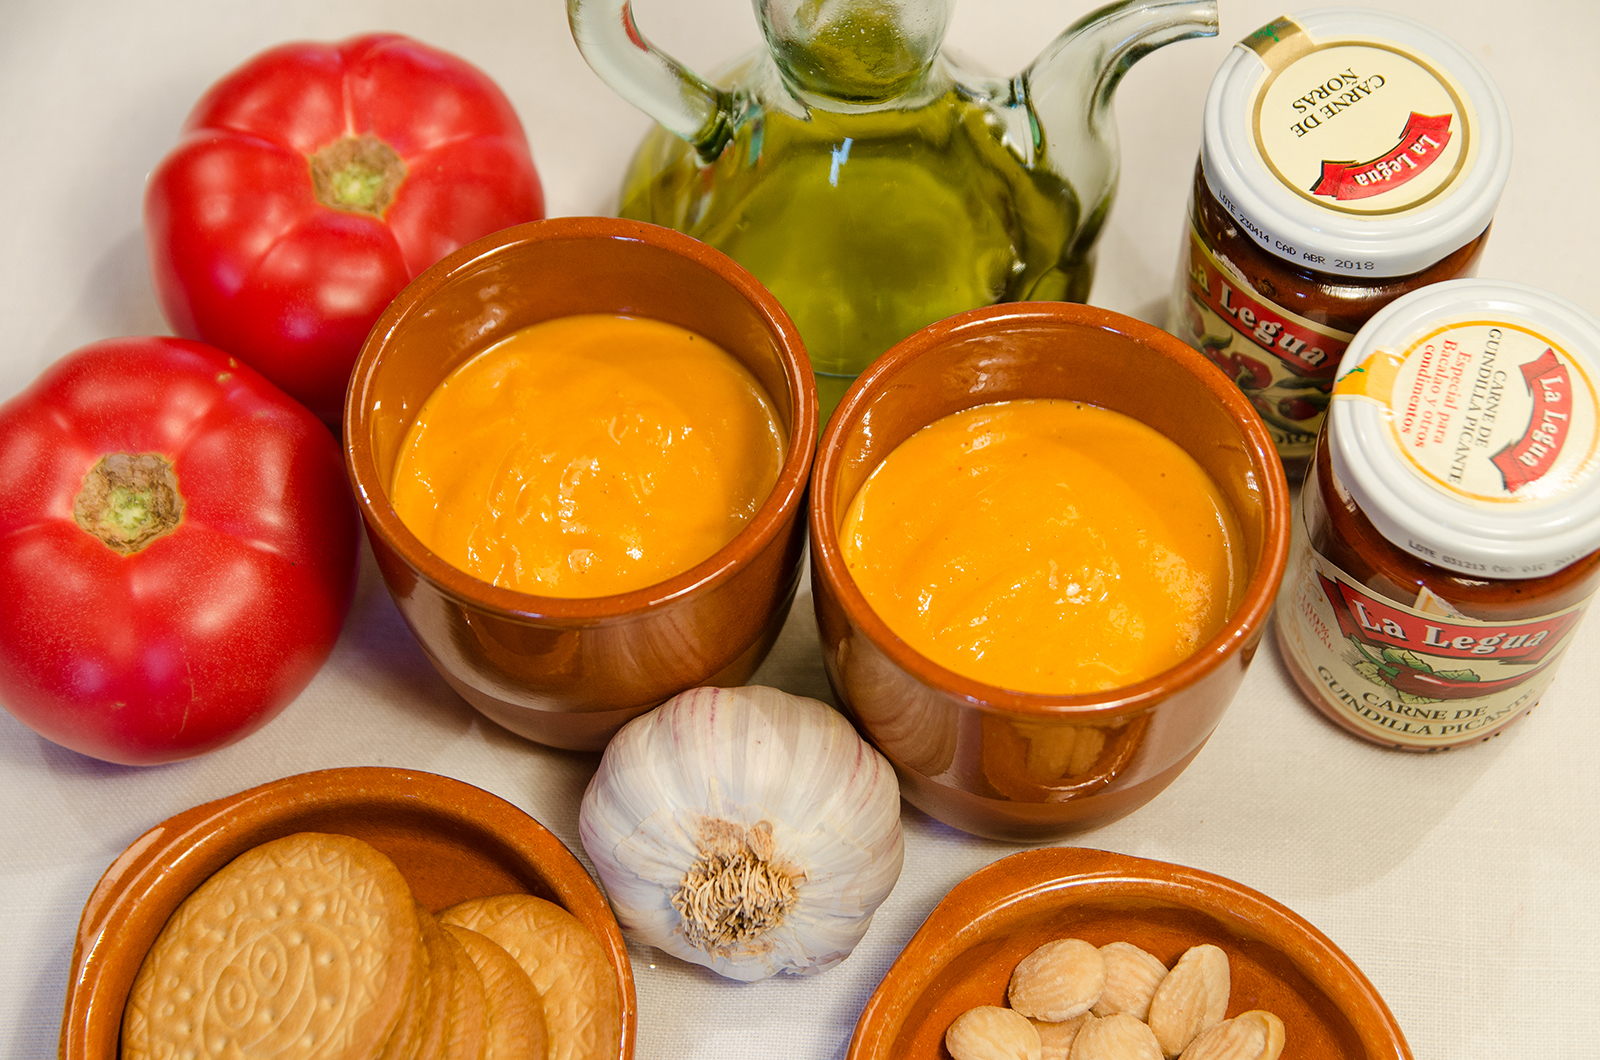 com-fer-como-hacer-salsa-calçots-romesco-salvitxada-recetas-receptes-cocina-cuina-tradicionals-bruja